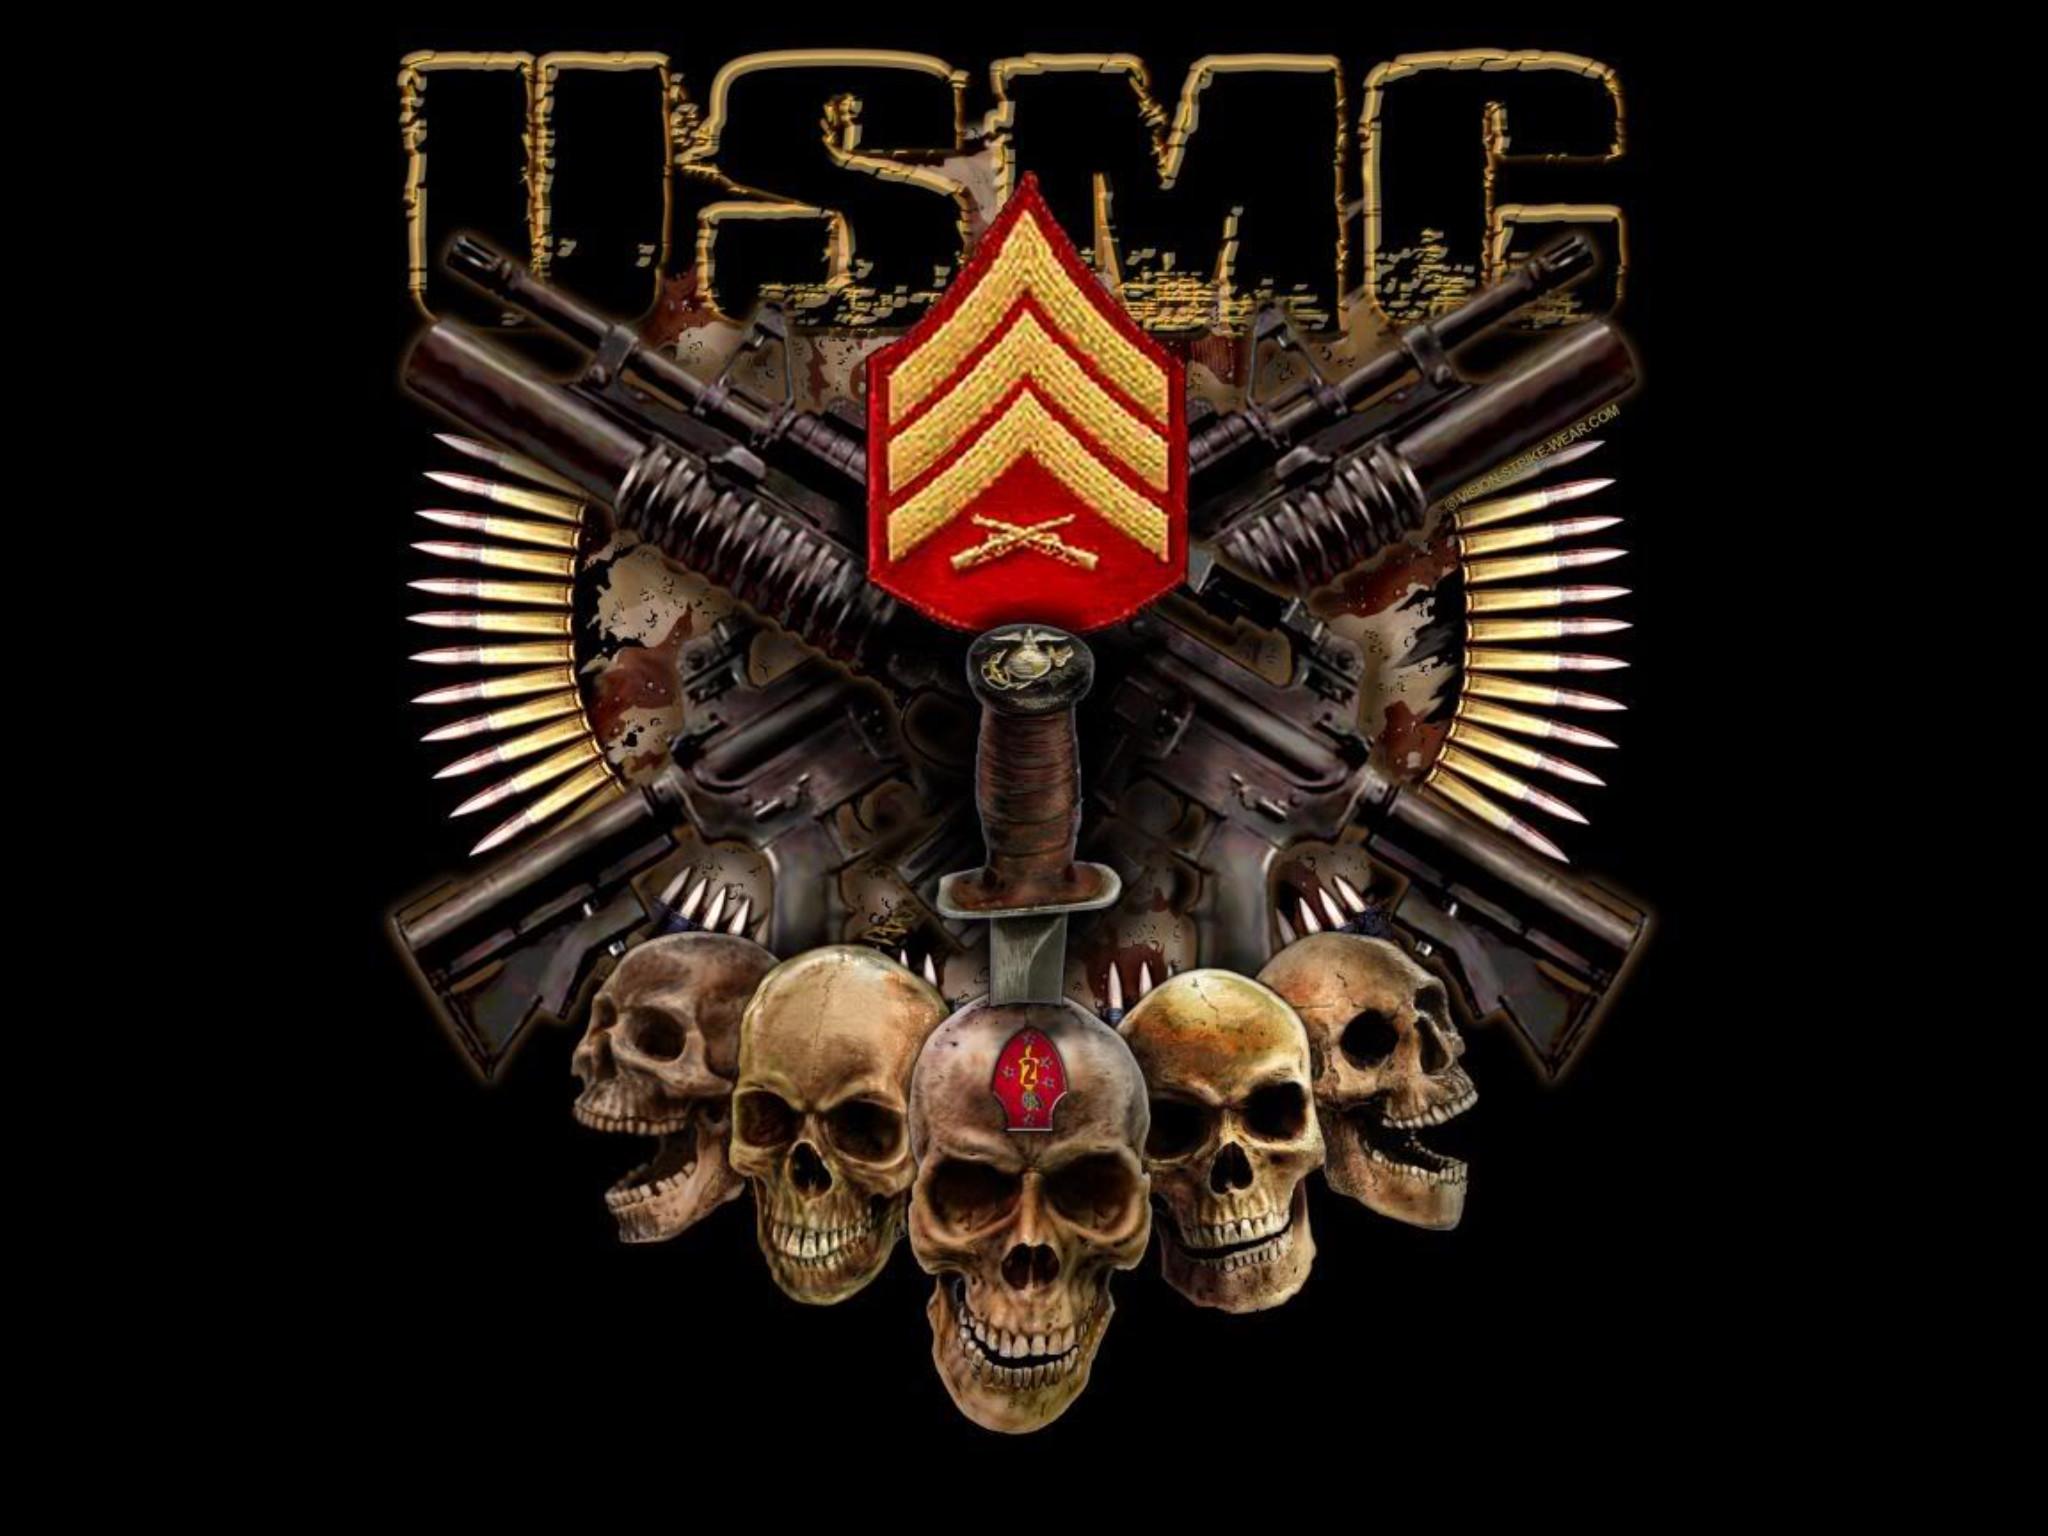 Awesome USMC wallpaper.